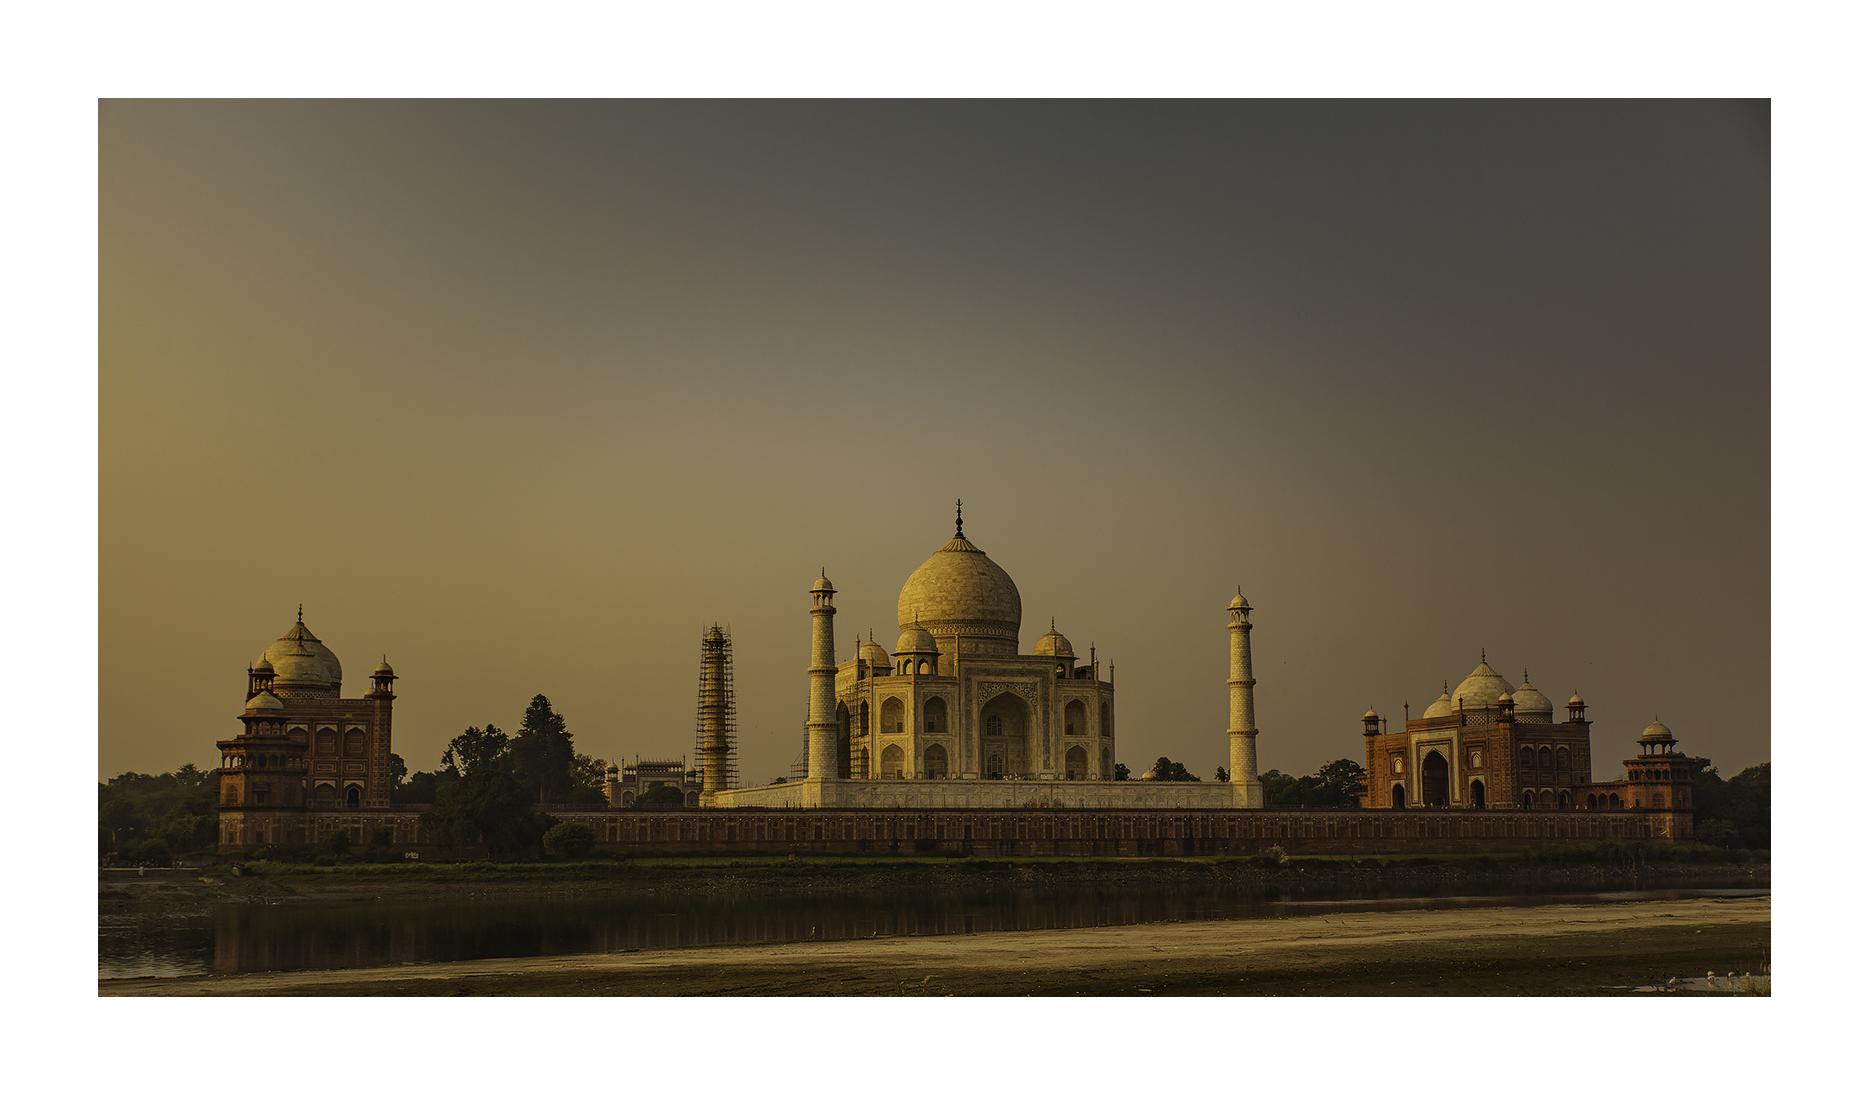 Taj Mahal - Panorámicas de India - MVilches , Fotográfia